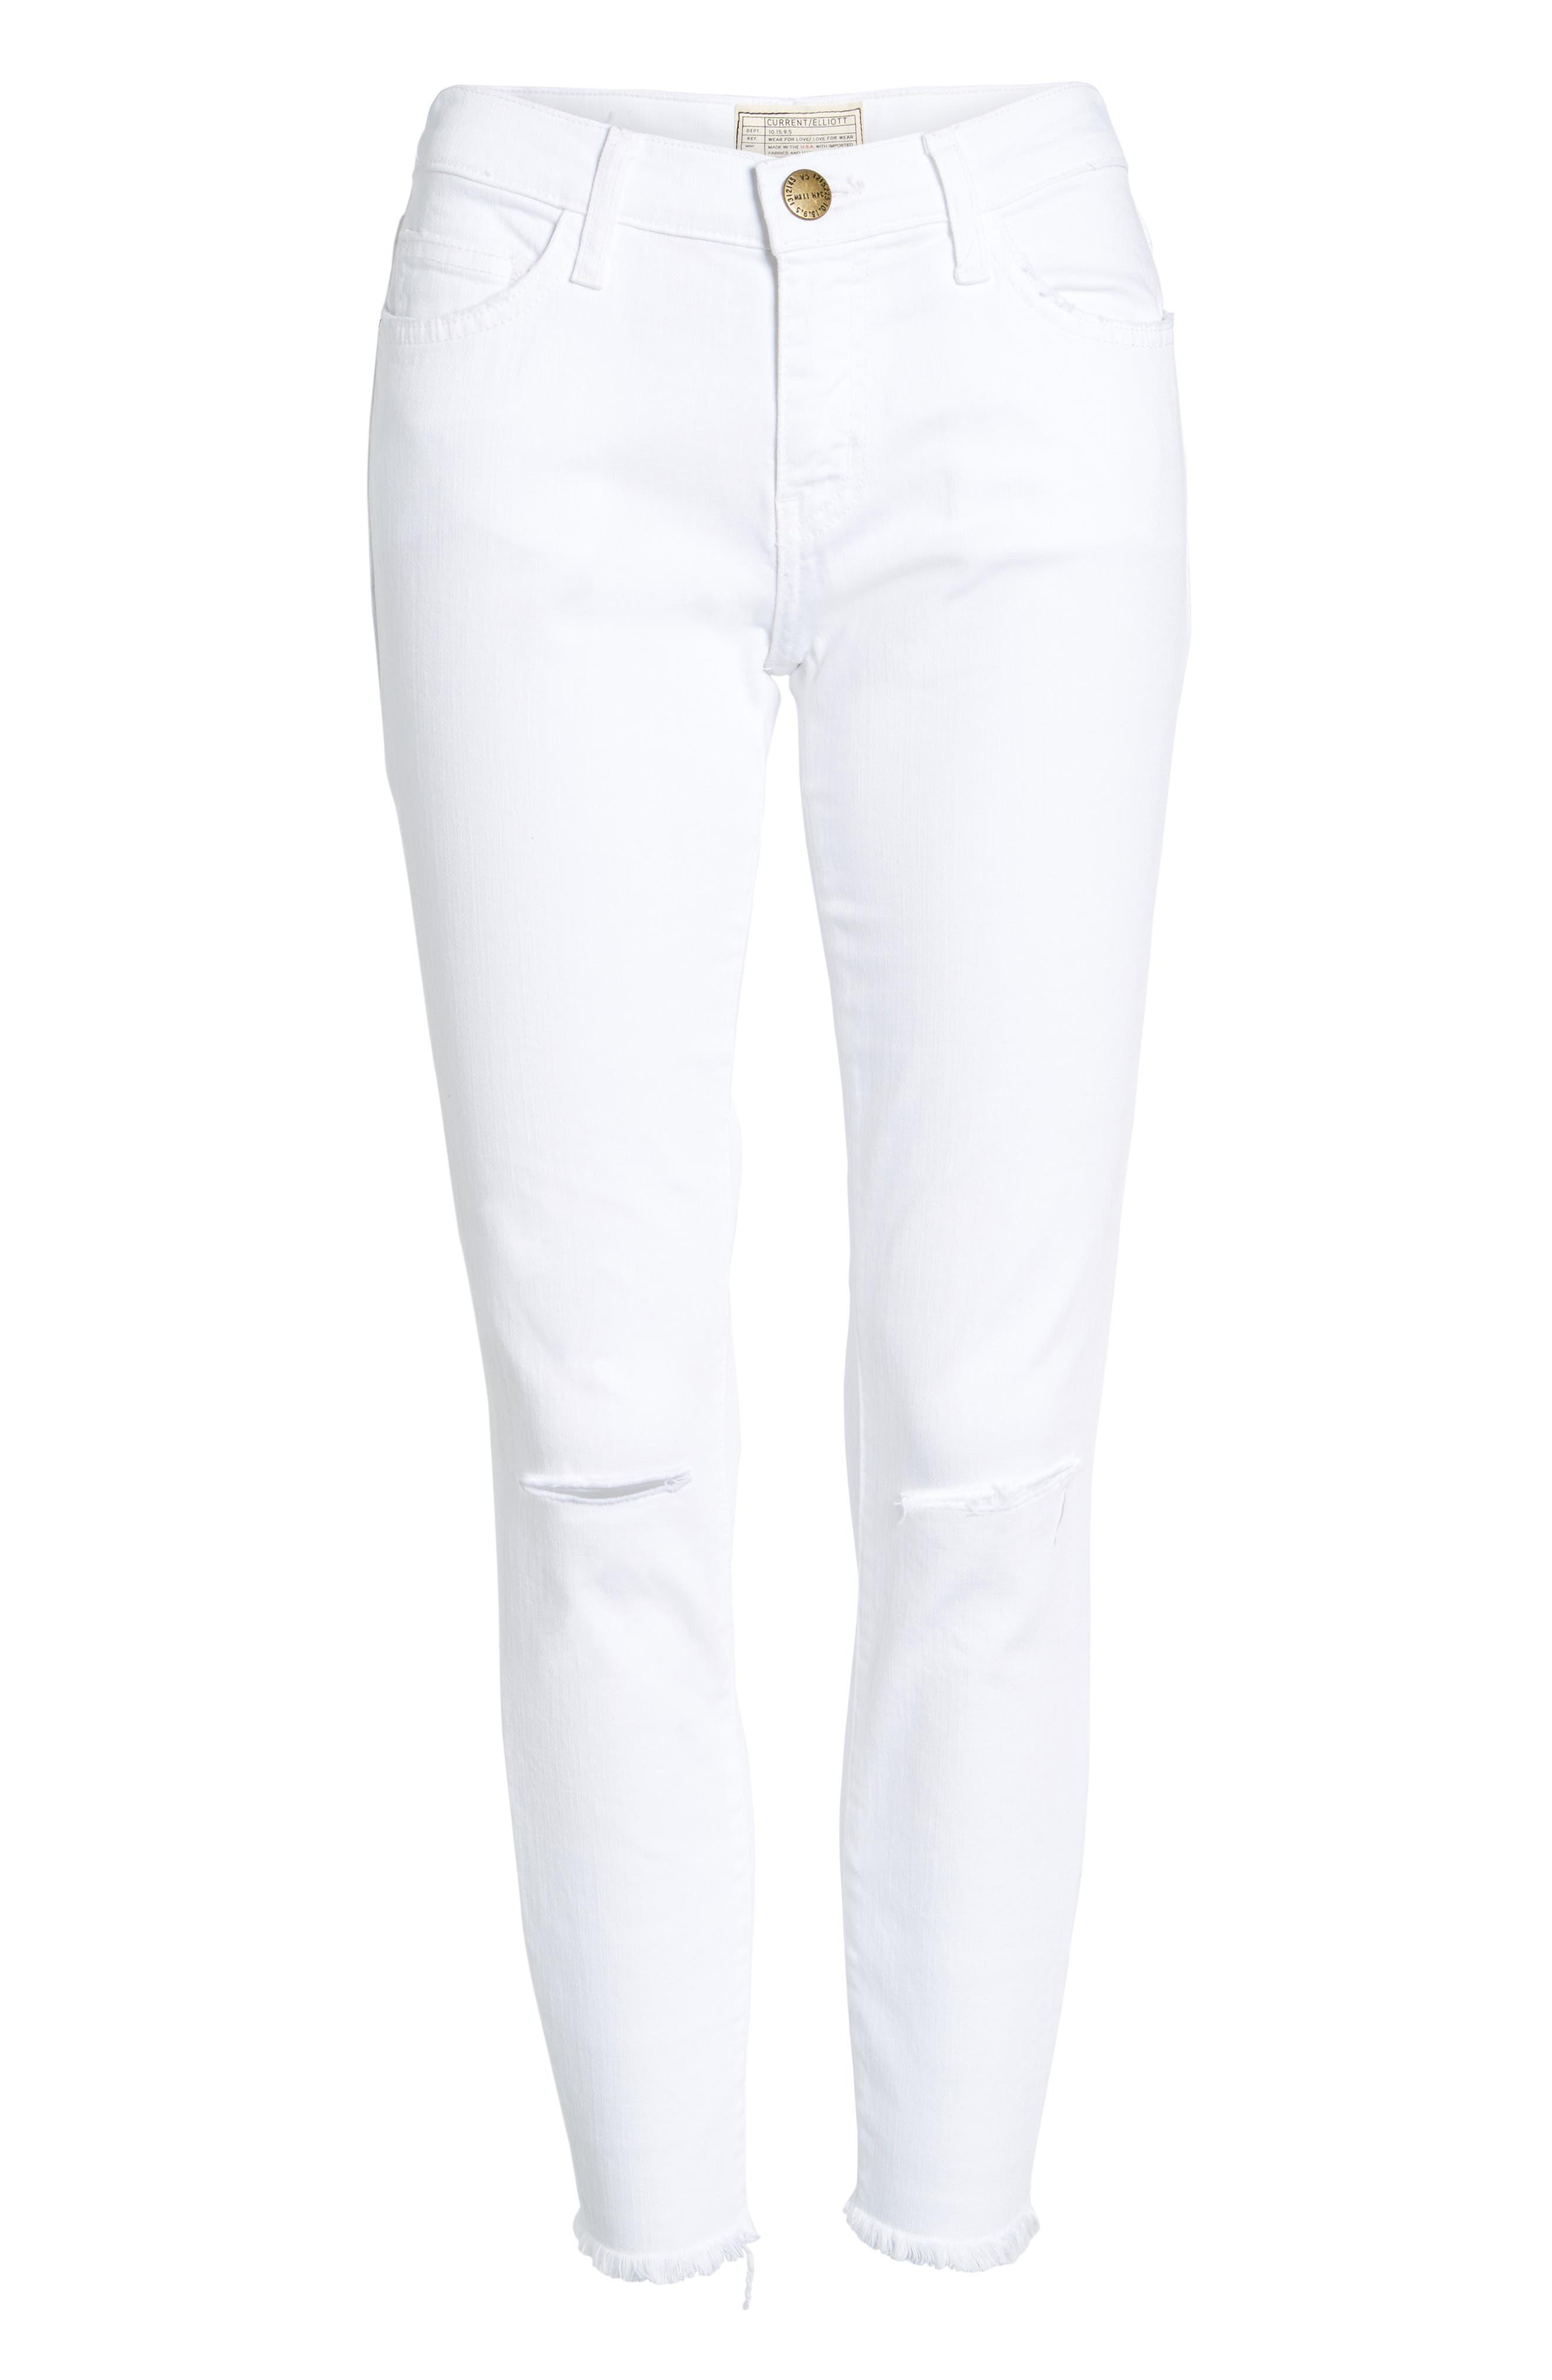 'The Stiletto' Jeans,                             Alternate thumbnail 2, color,                             100